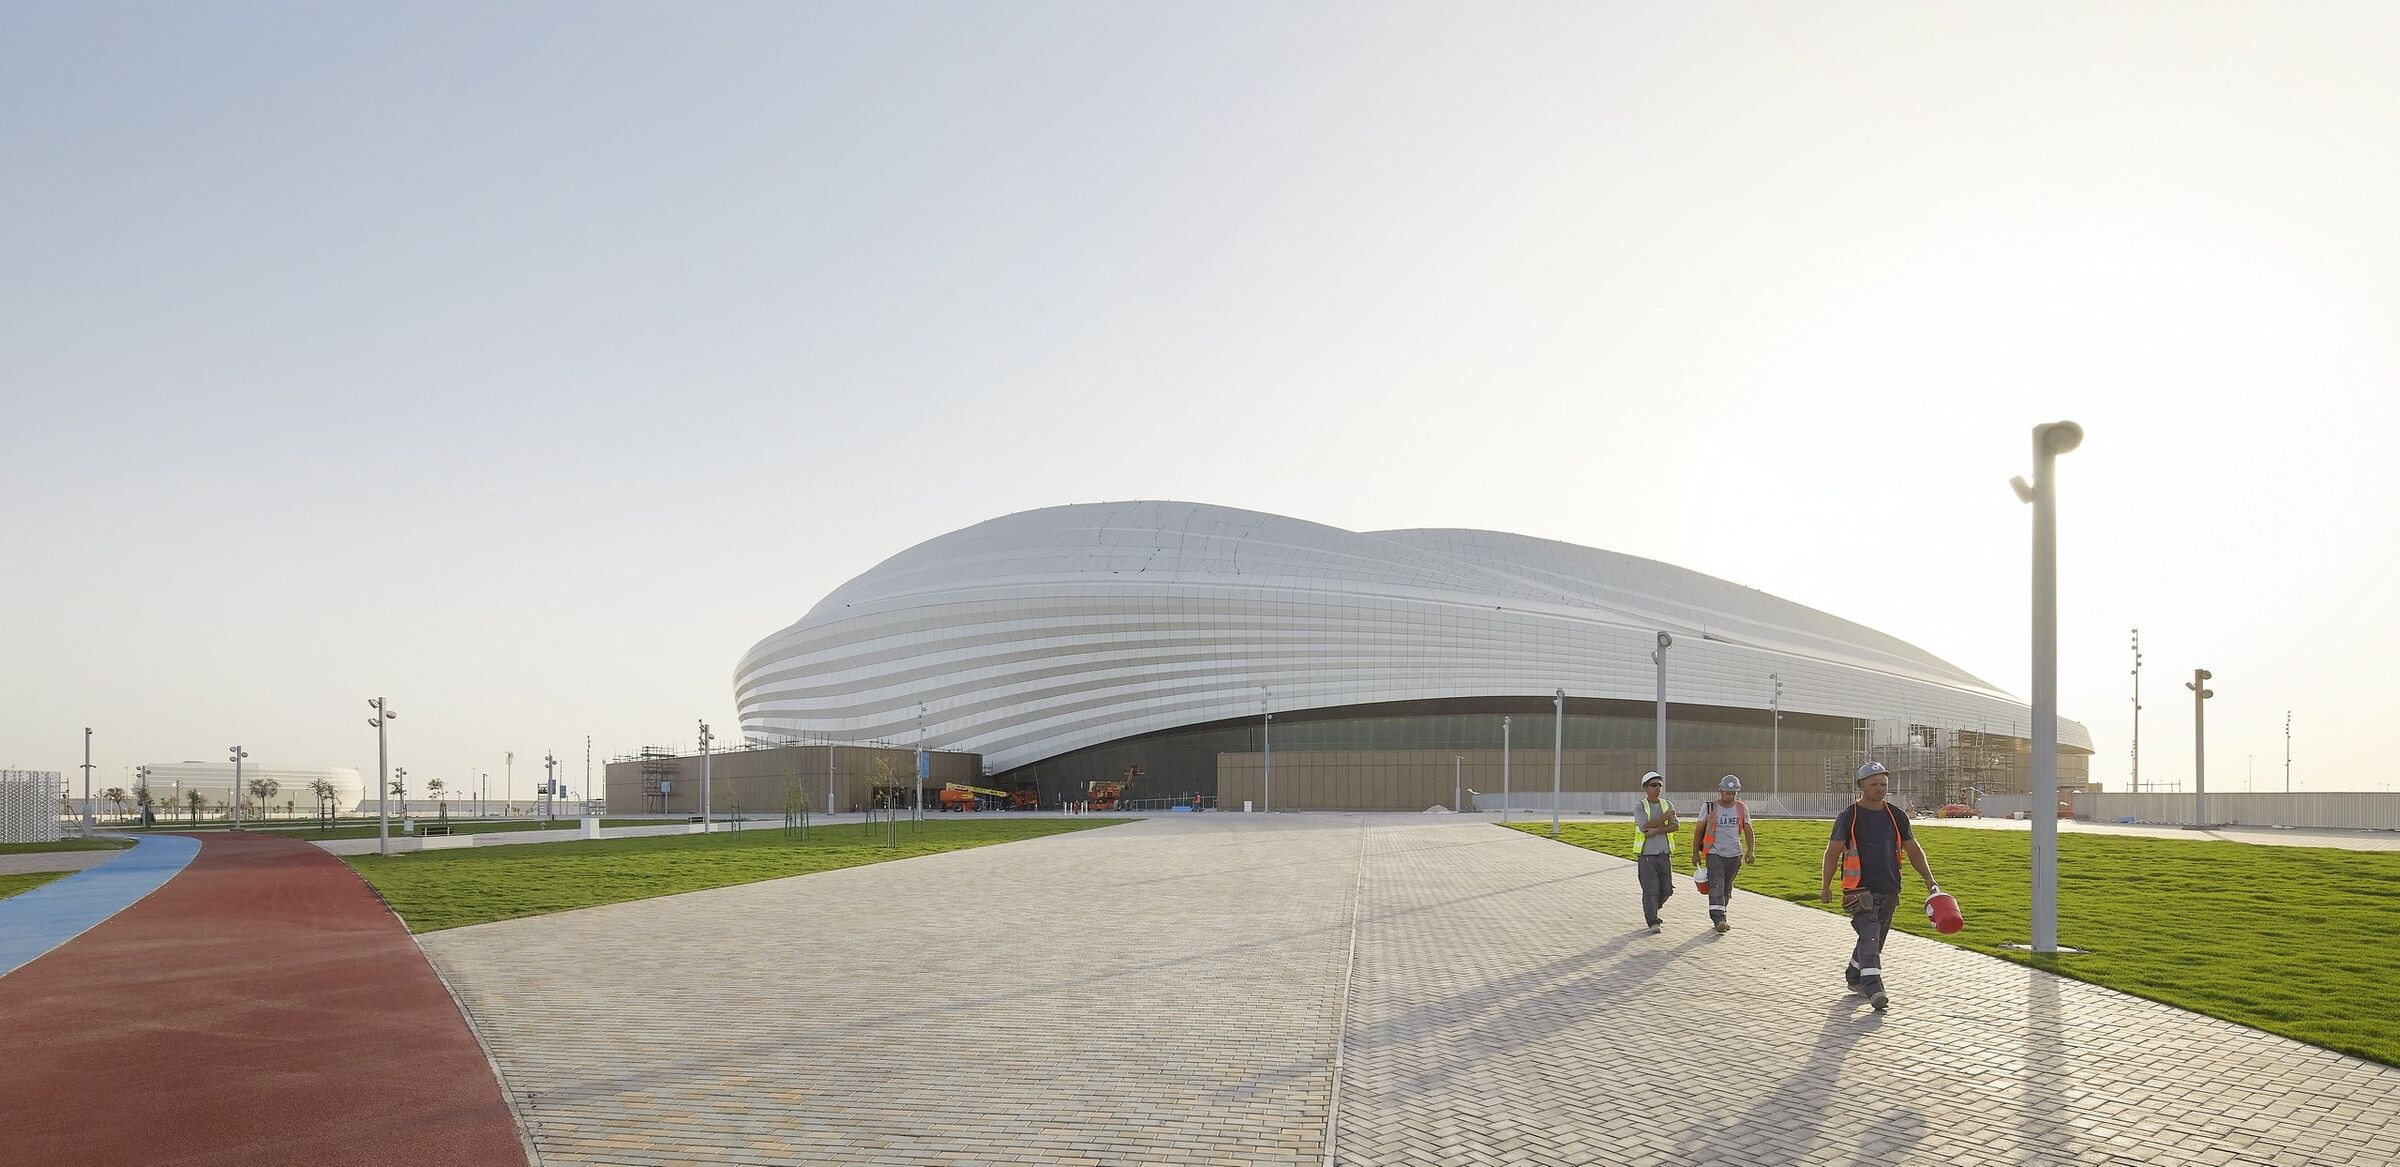 Al Janoub Stadium in Al Wakrah